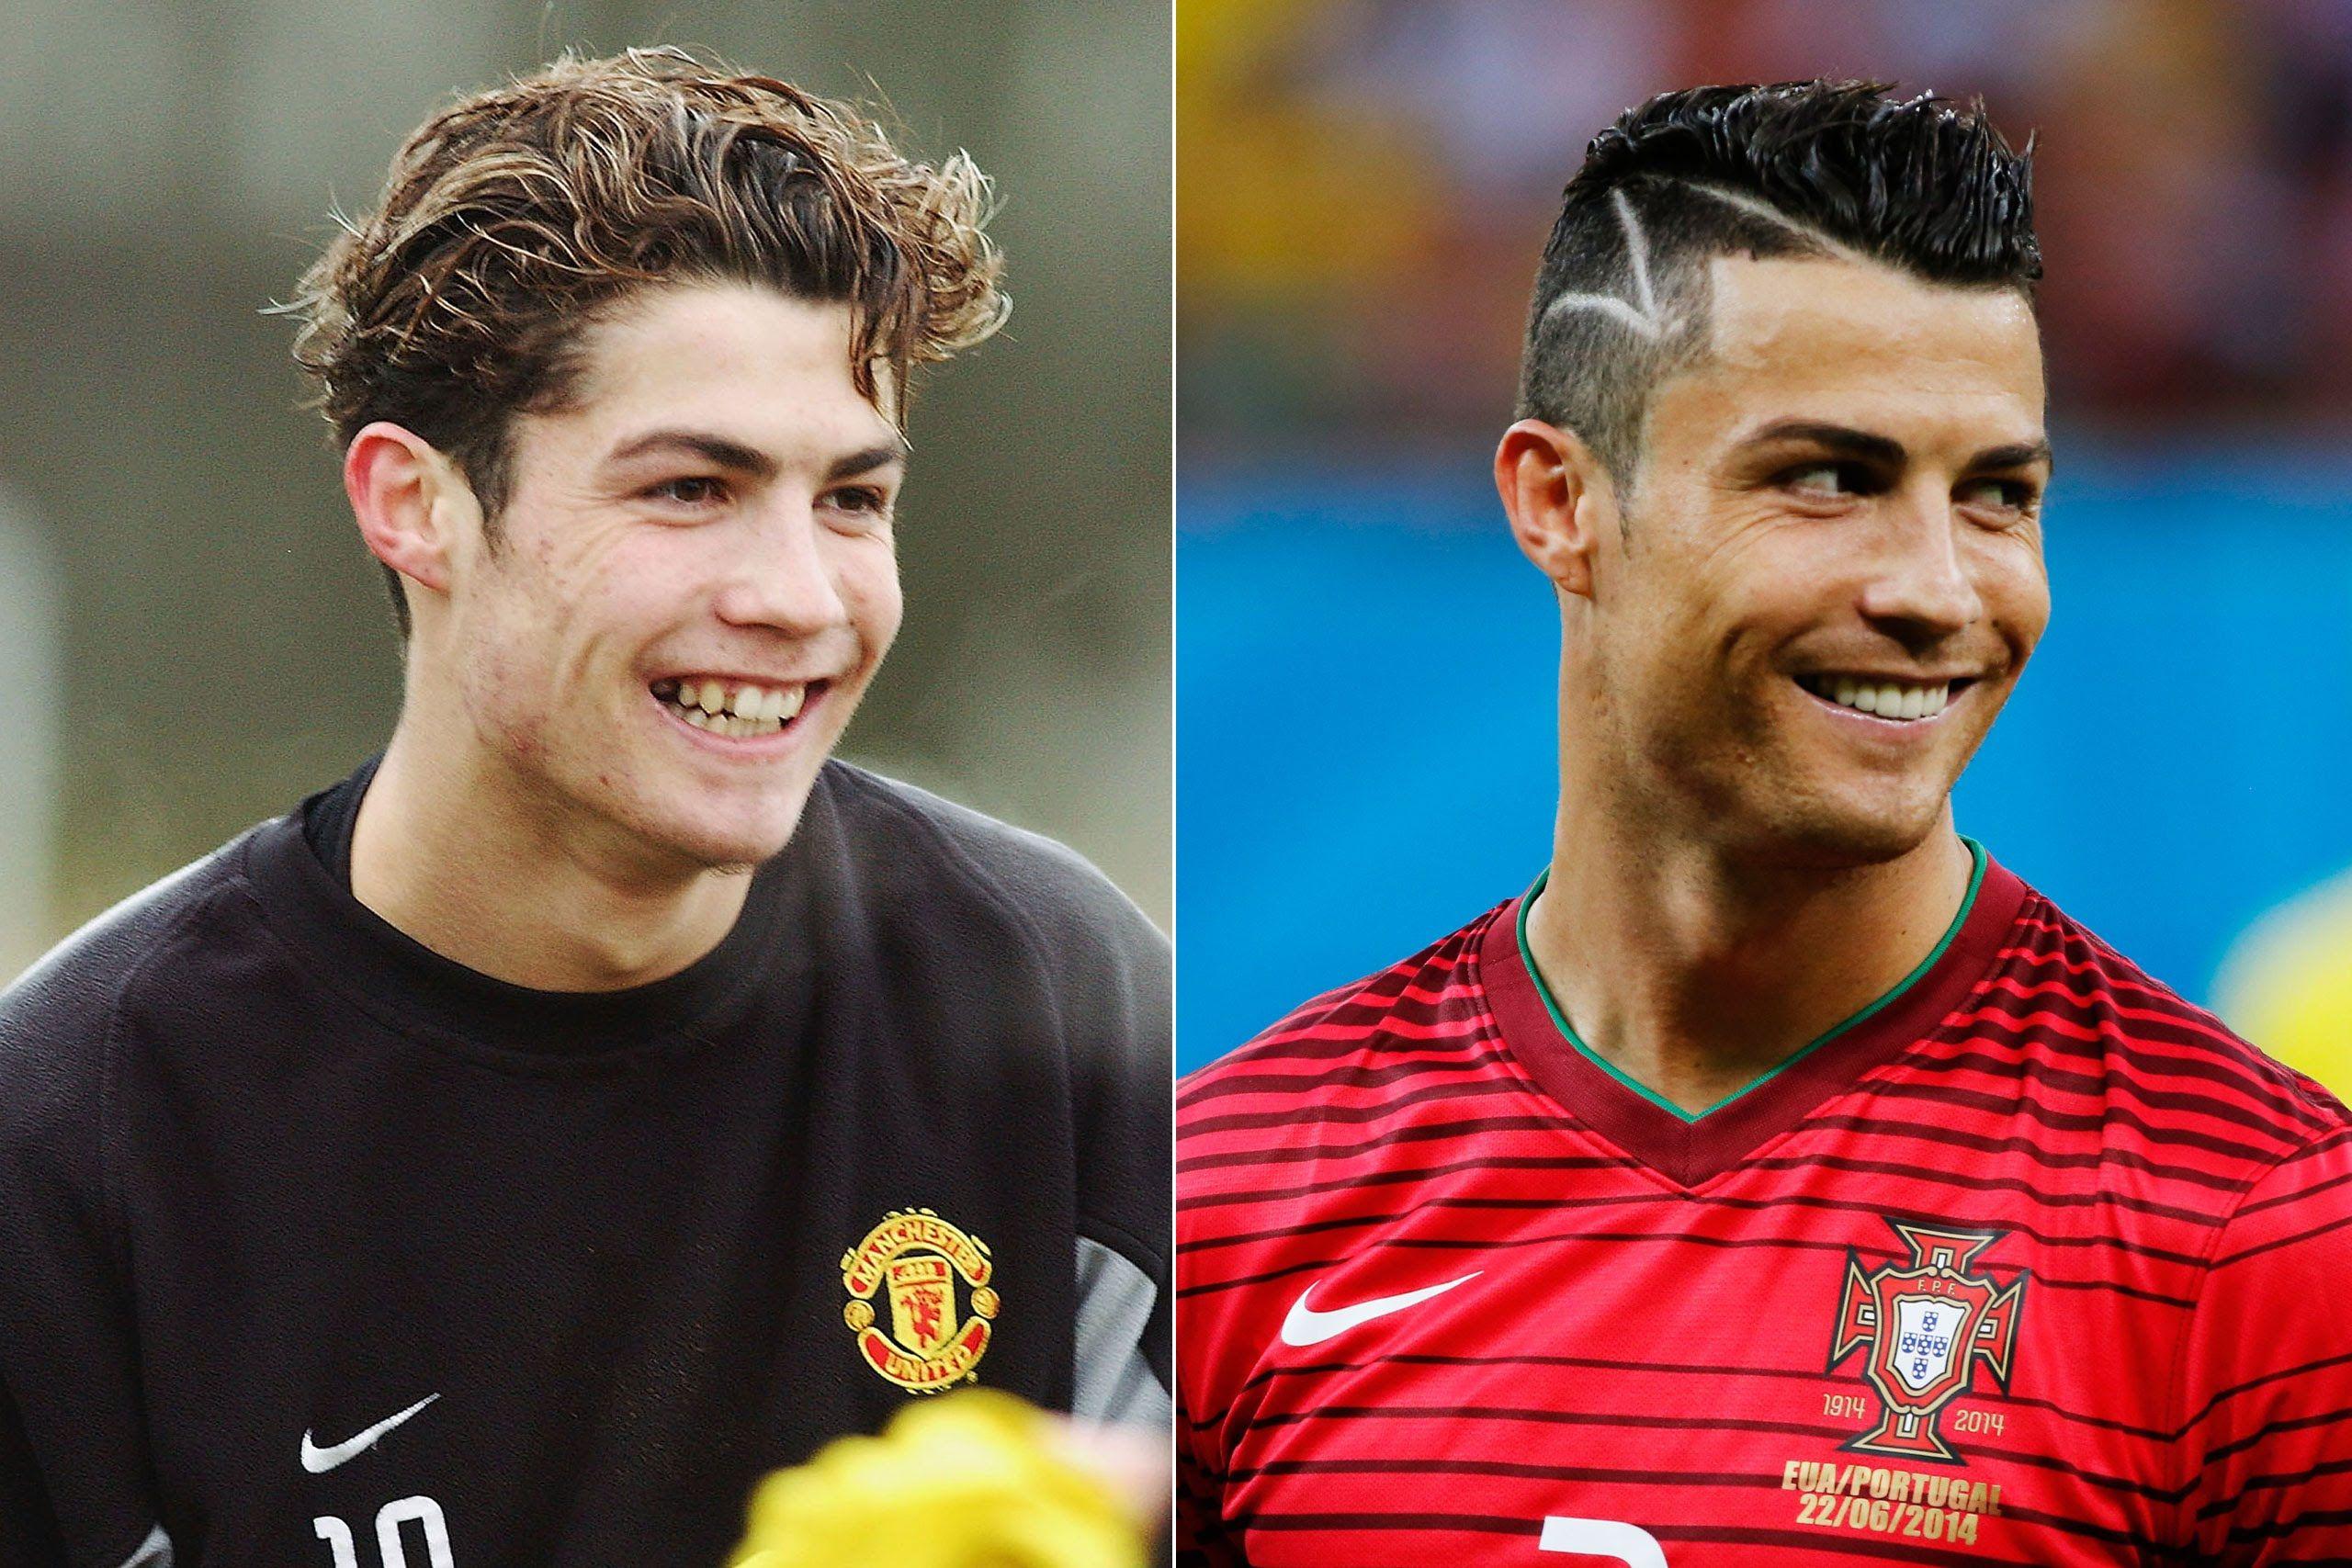 Cristiano Ronaldo Progress Season By Season 2002 2016 Http 1703866 Talkfusioninstantpay Com Cristiano Ronaldo Ronaldo Cristano Ronaldo